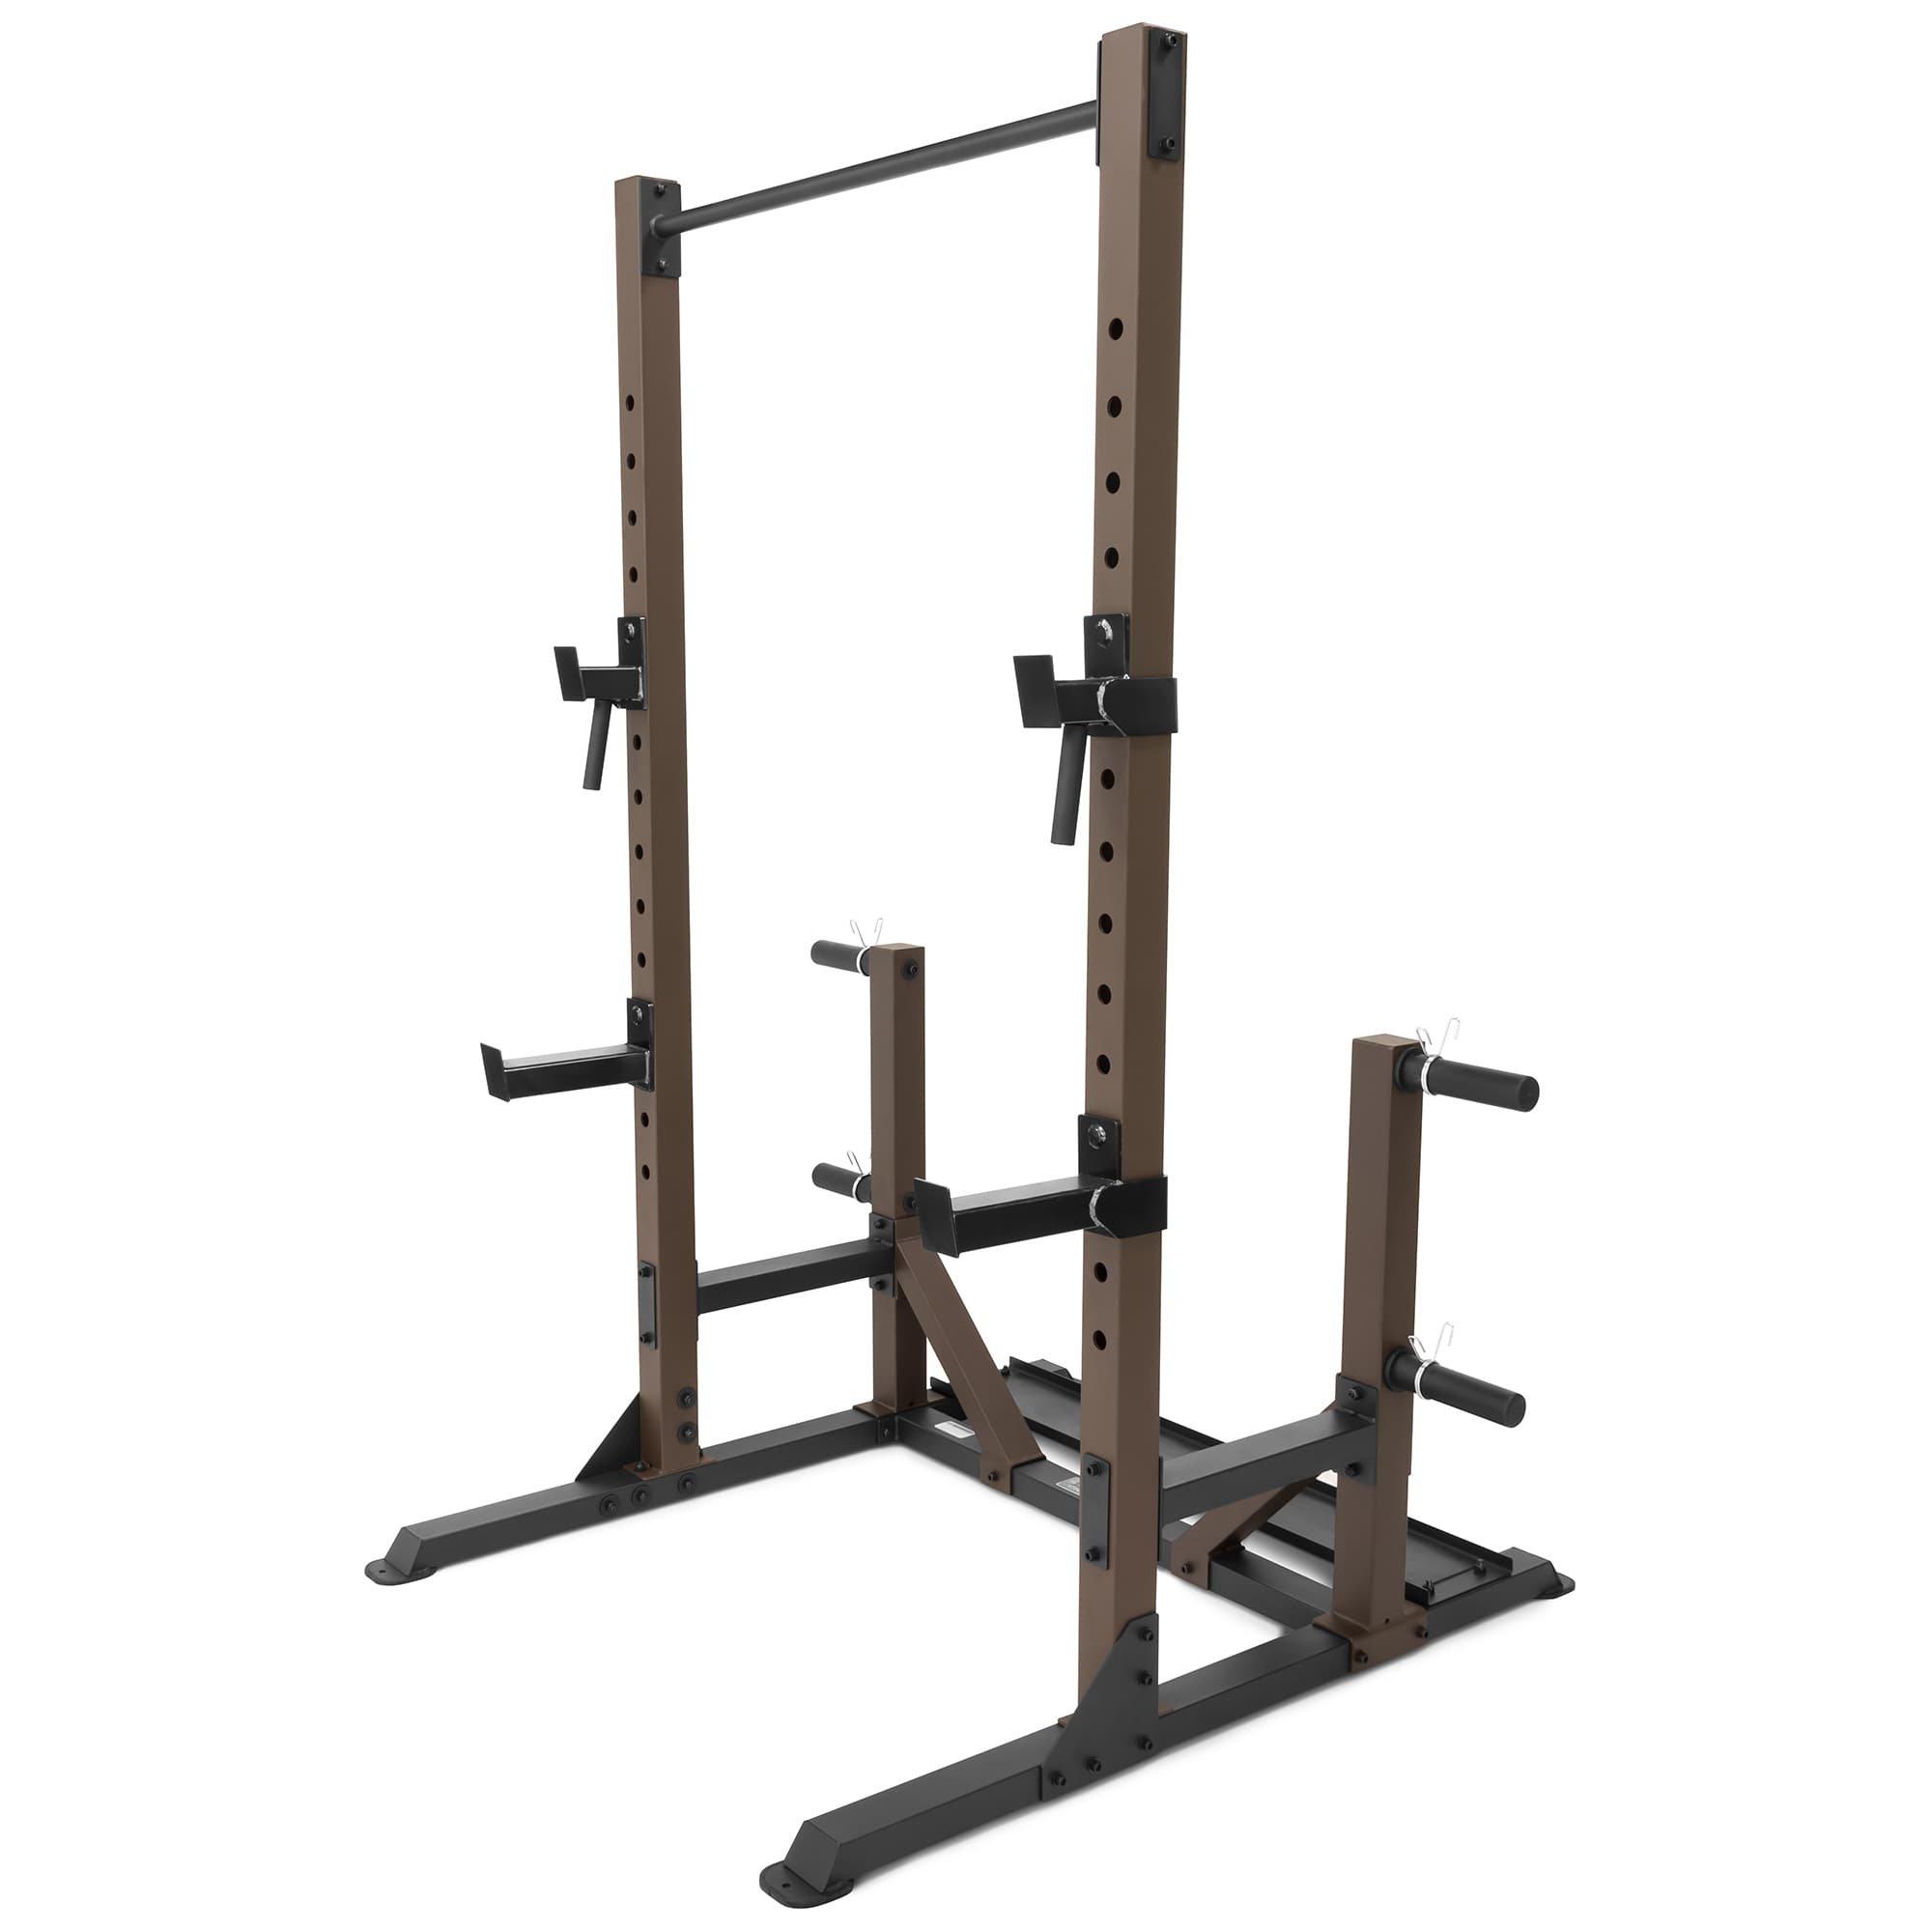 SteelBody Utility Trainer - Strength Training Equipment STB-98010 by Steelbody